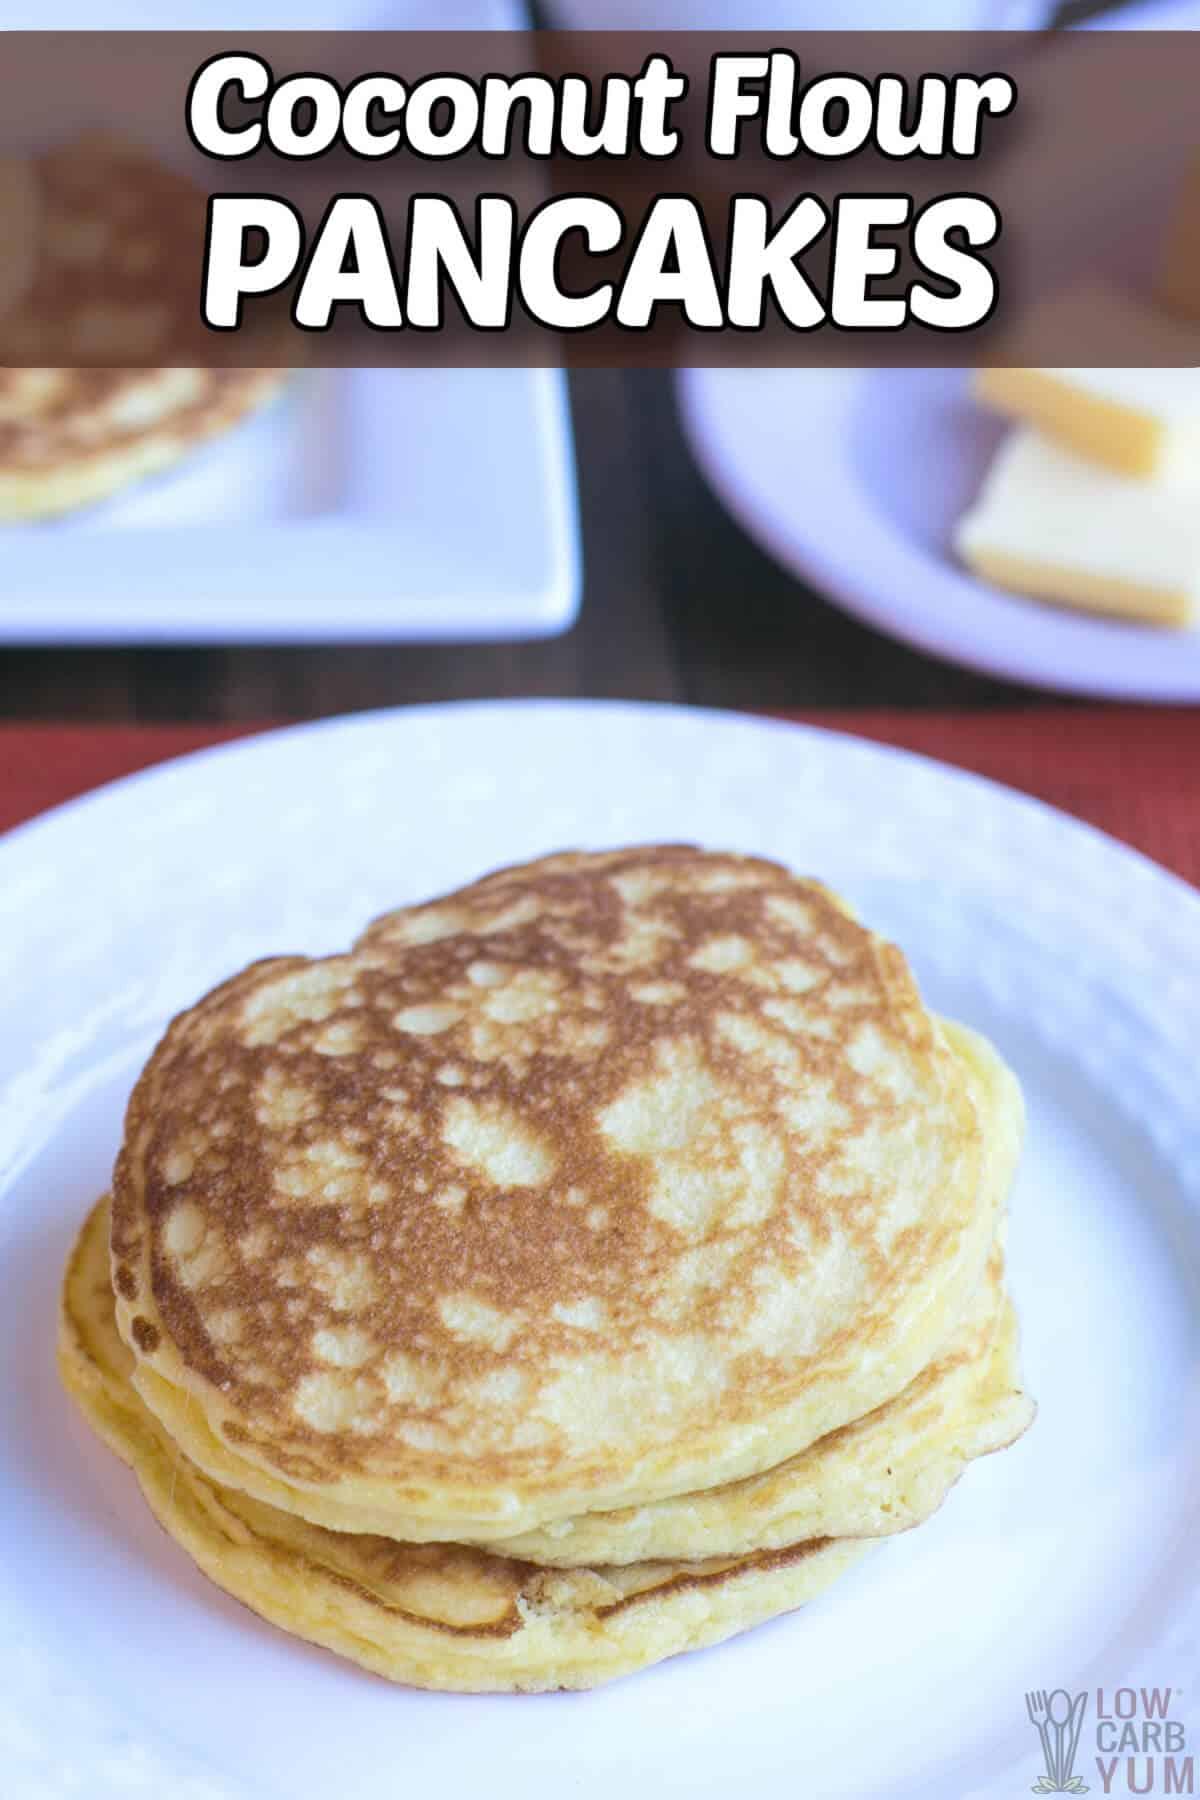 keto coconut flour pancakes recipe pinterest image